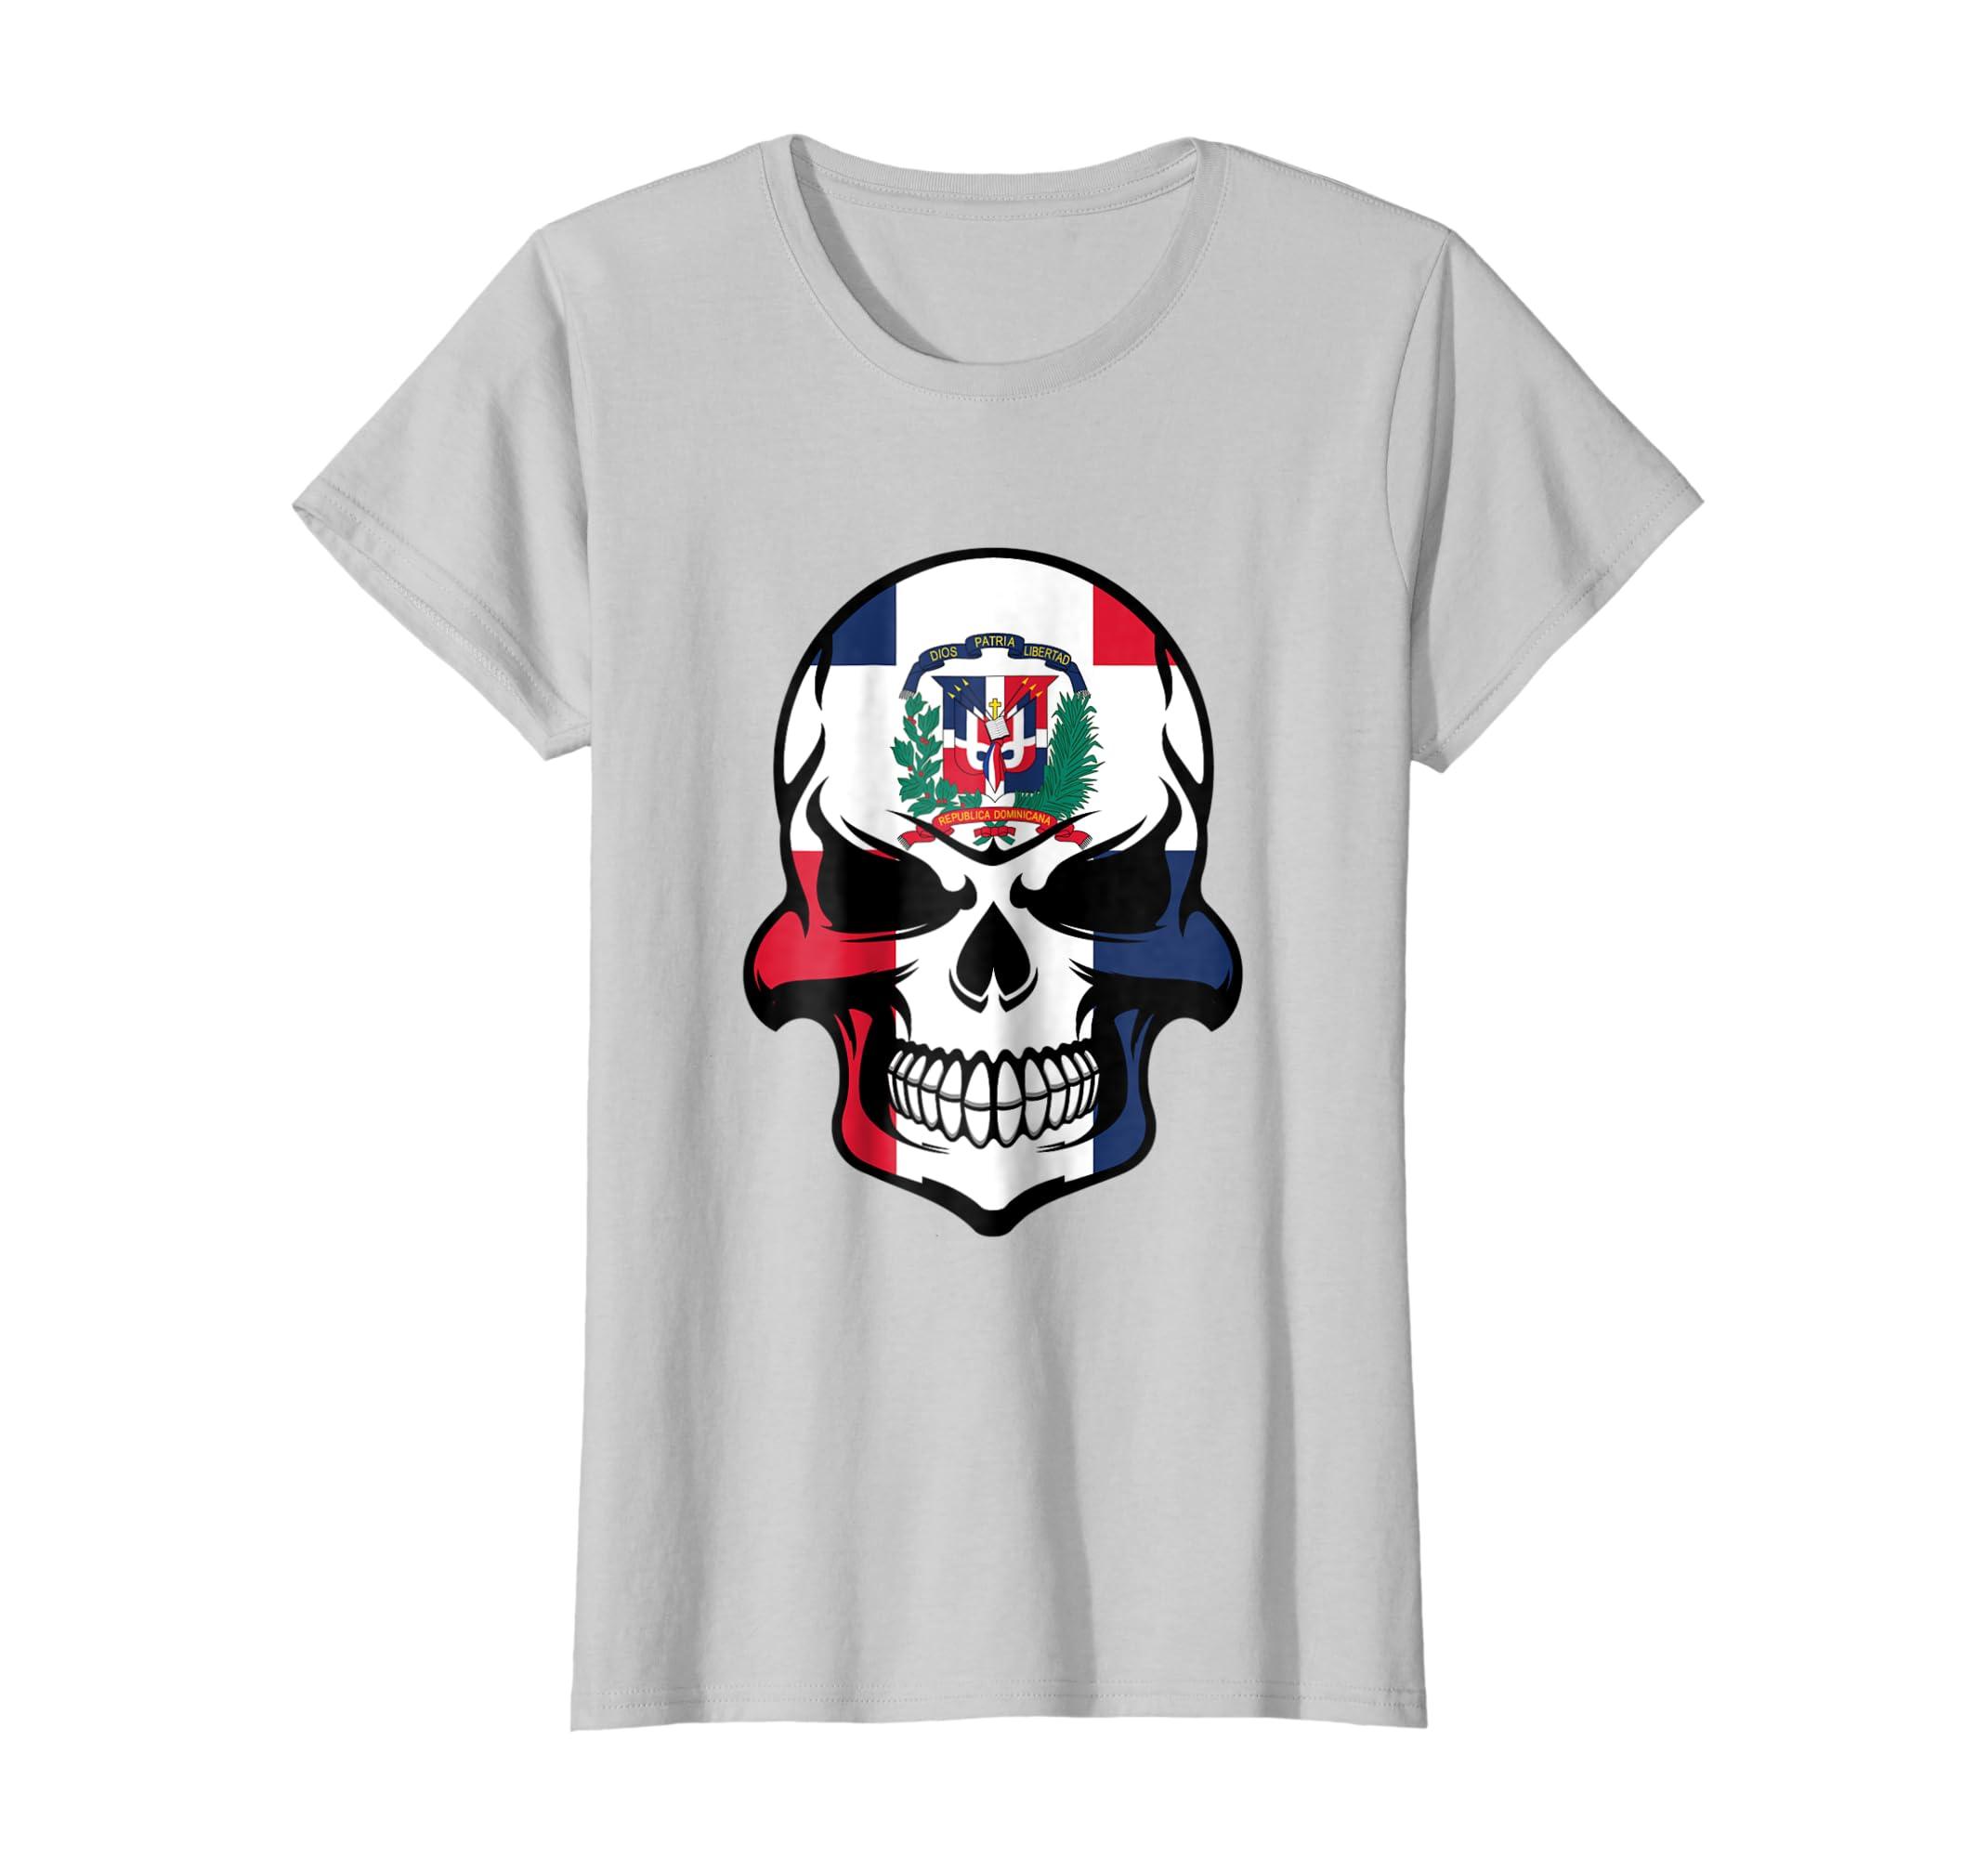 ee4dcfde Amazon.com: Dominican Flag Skull Cool Dominican Republic Skull T-Shirt:  Clothing